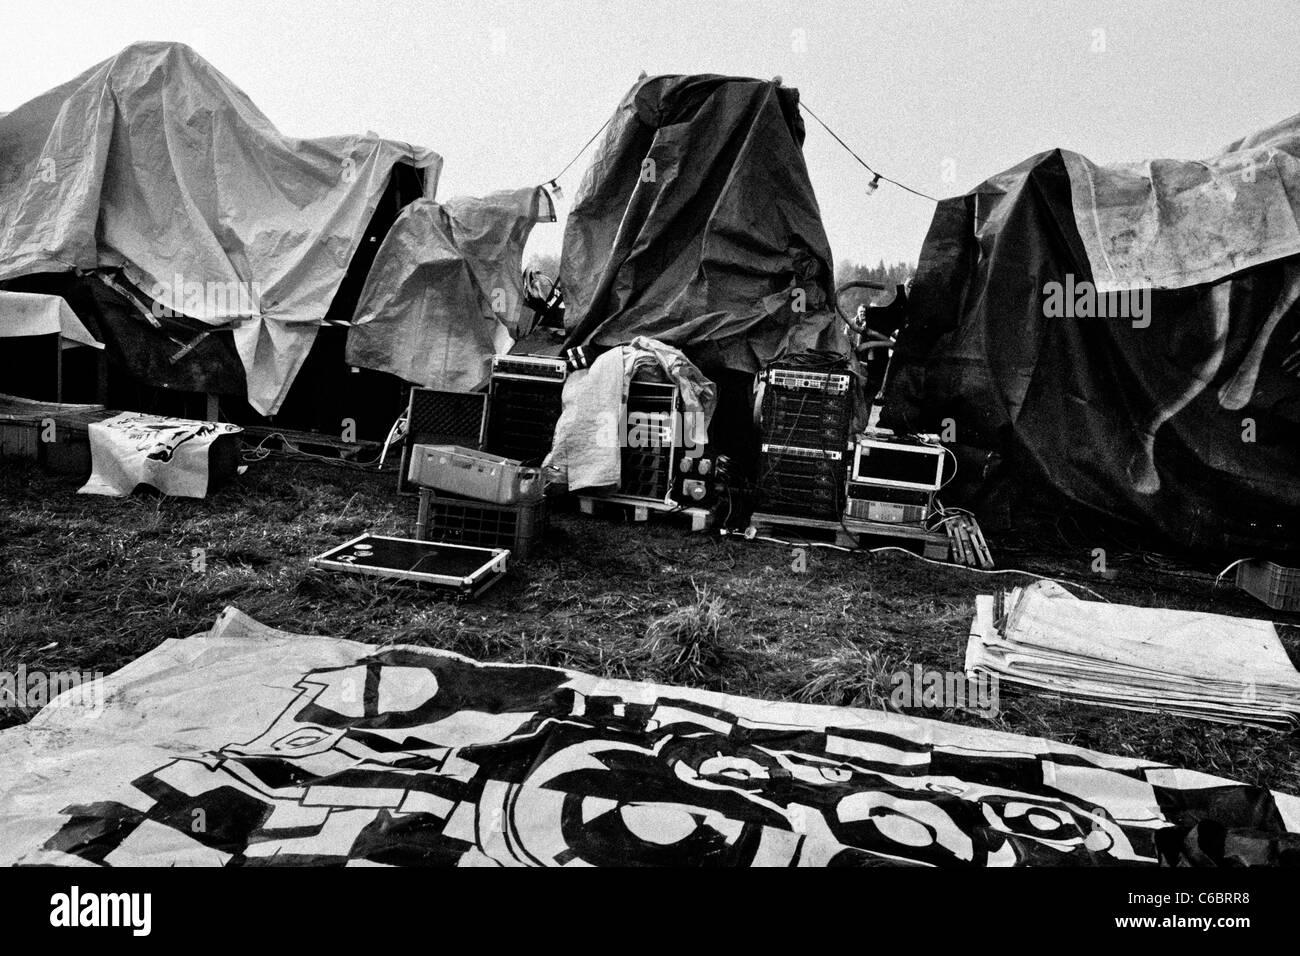 "The Sound System speakers covered by sheets at Czech Free Tekno Festival ""Czarotek"" close to Květná, Czech Republic. Stock Photo"